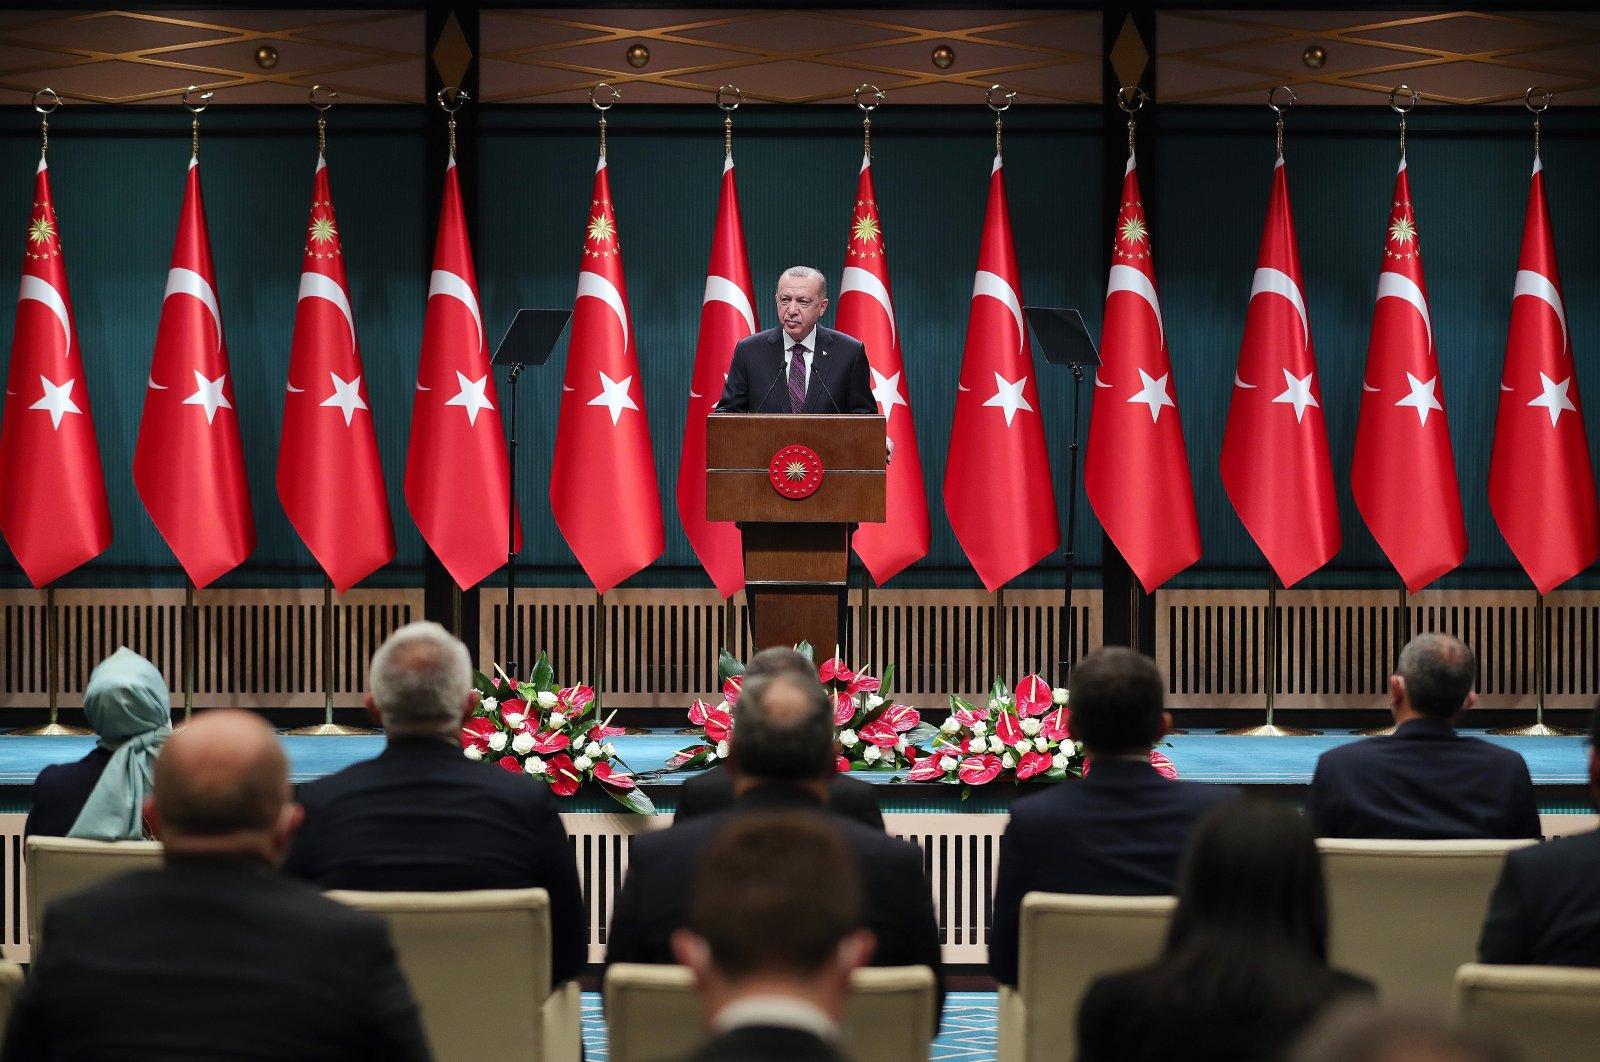 President Recep Tayyip Erdoğan speaks after a Cabinet meeting in the capital Ankara, Turkey, Dec. 28, 2020. (AA Photo)